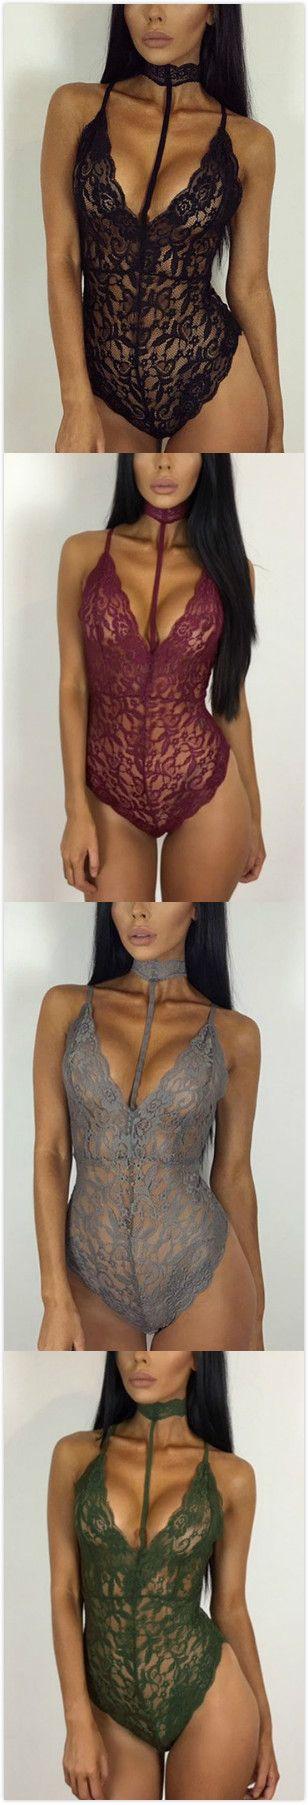 Halter Neck Strappy Lace Bodysuit